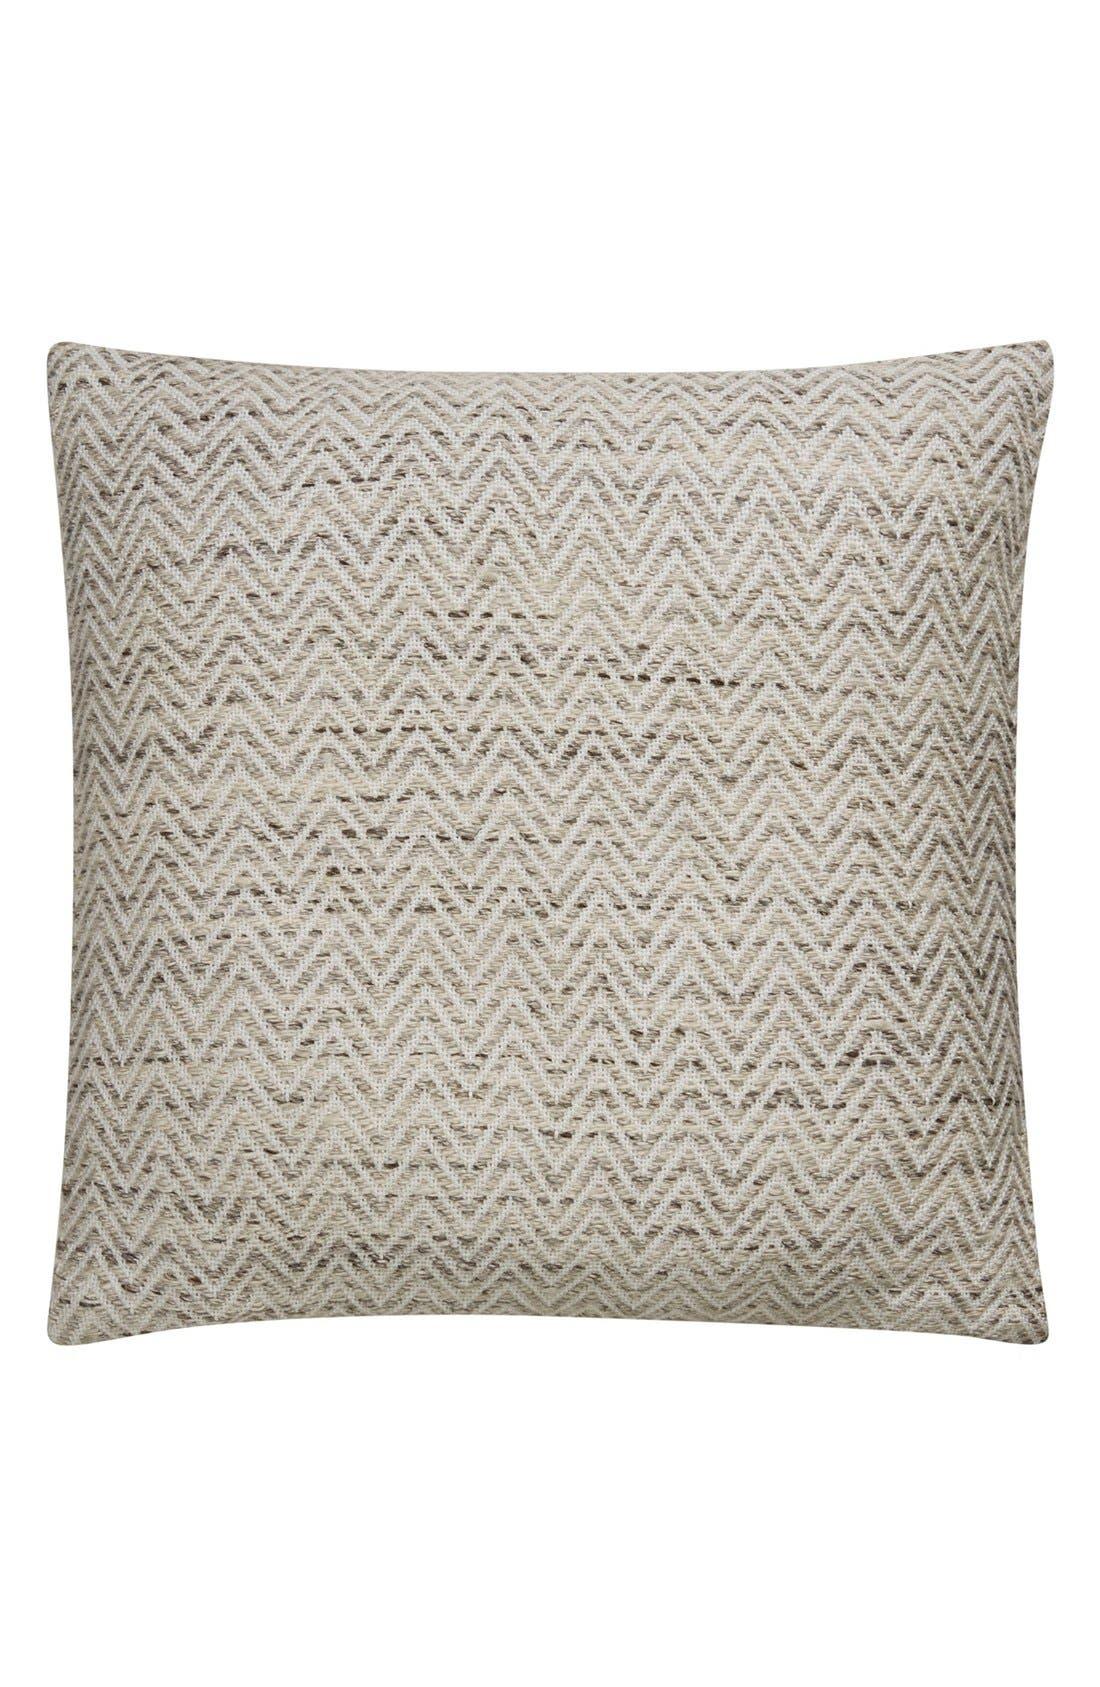 Main Image - Jaipur 'Peykan' Pillow